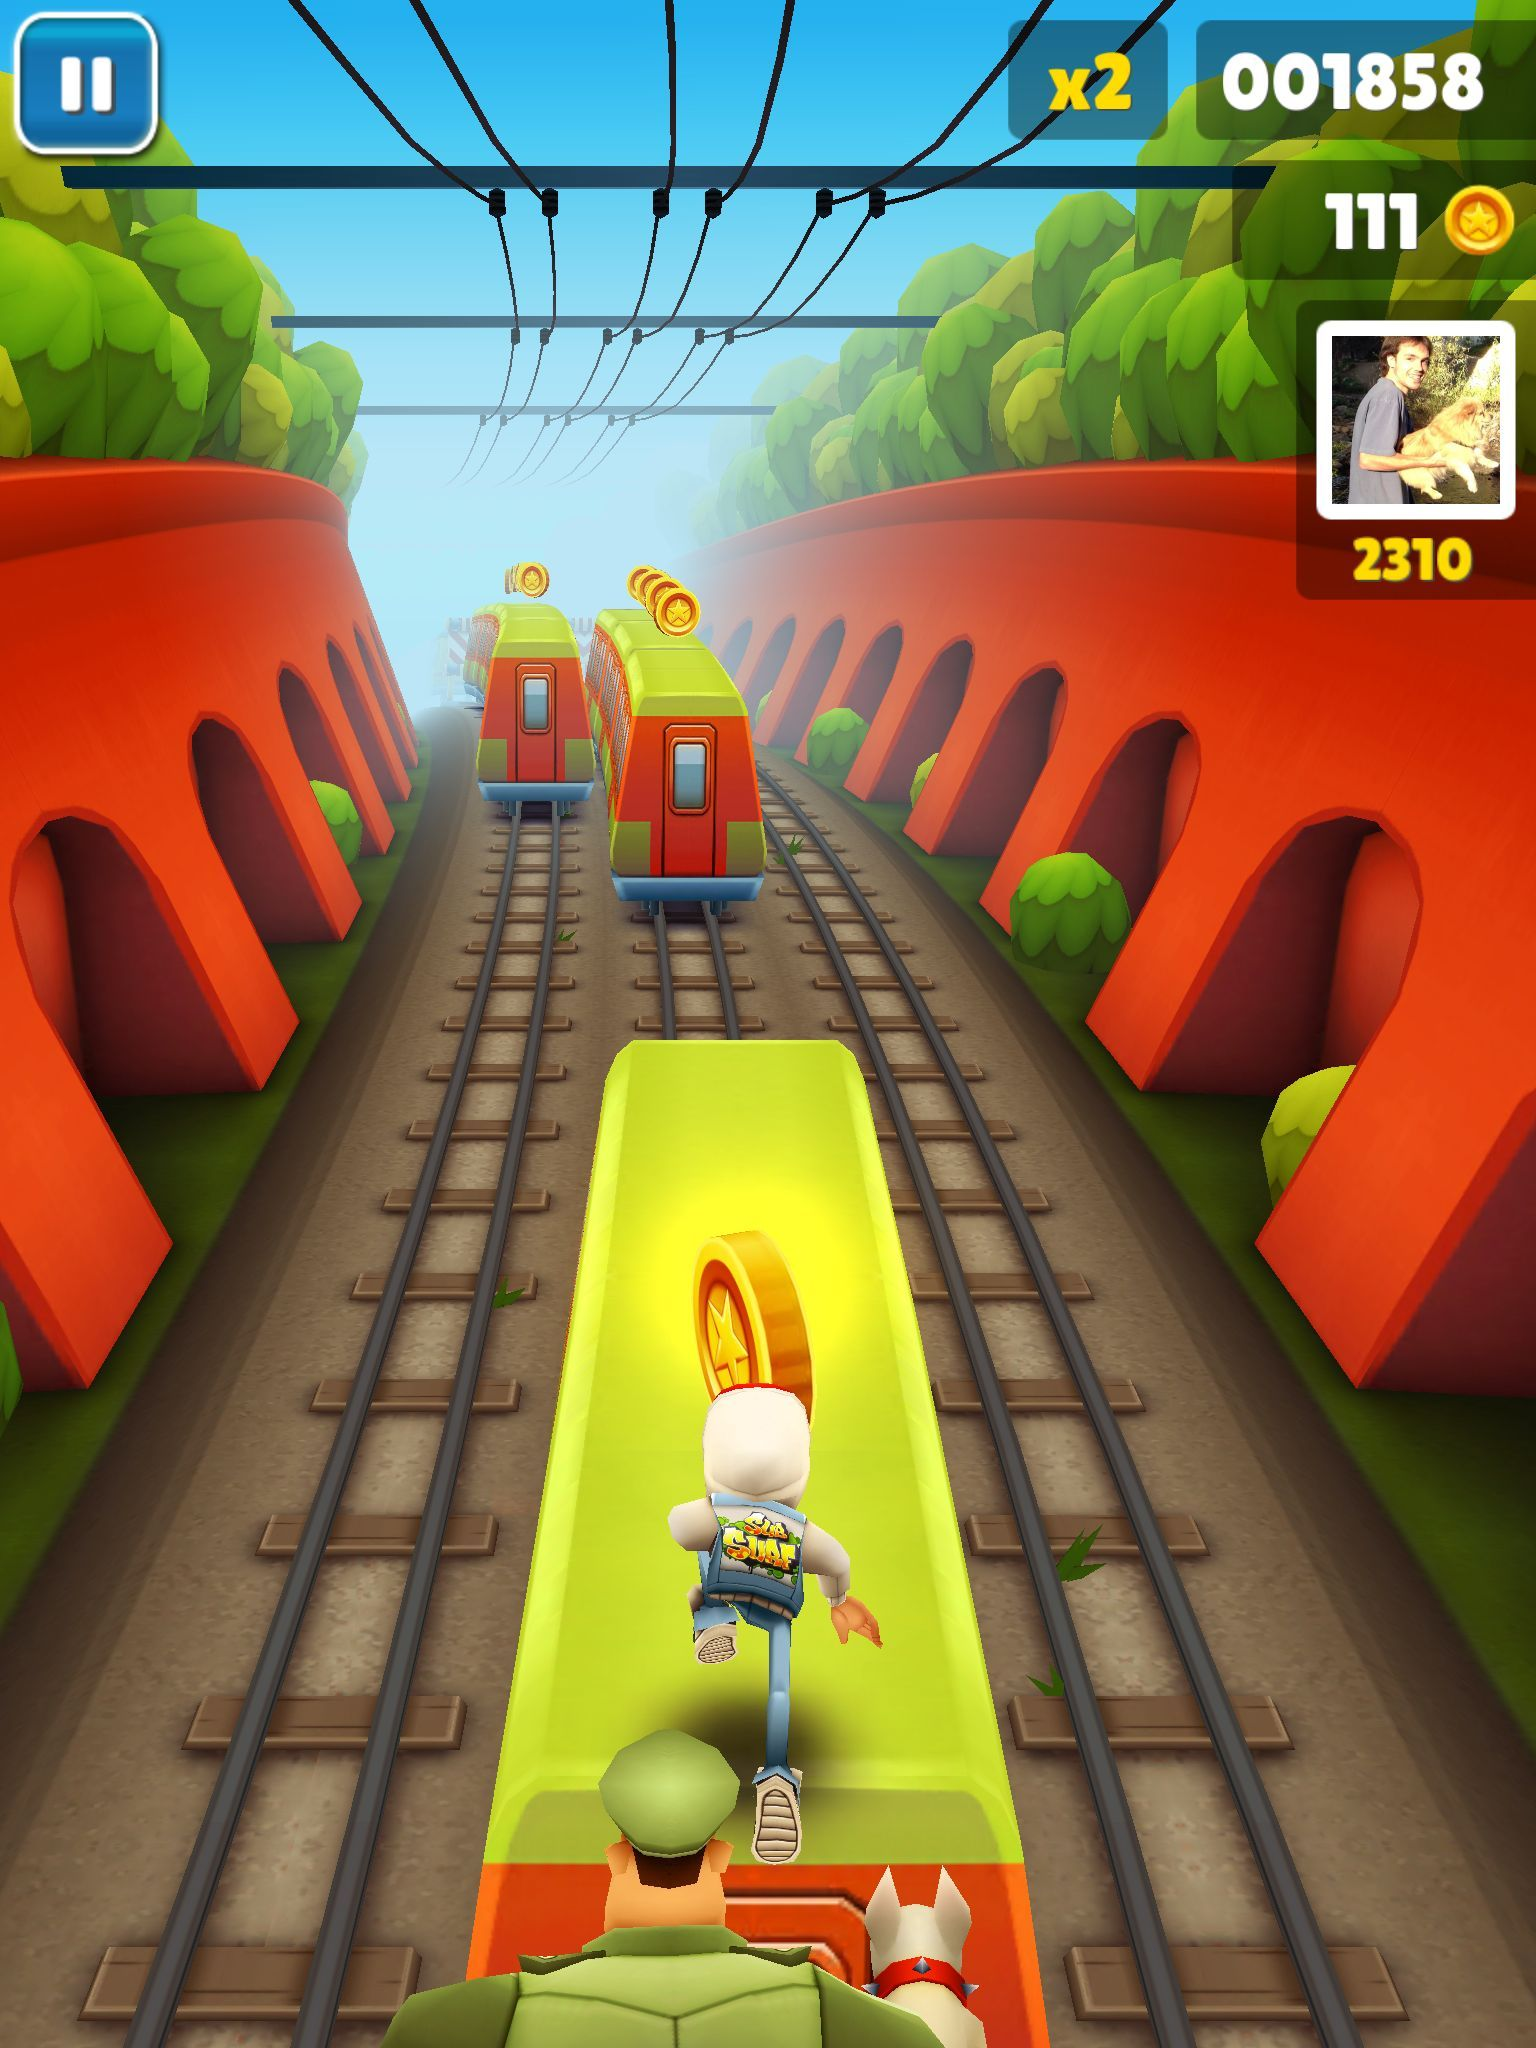 subway surfers game screenshot Subway surfers, Subway